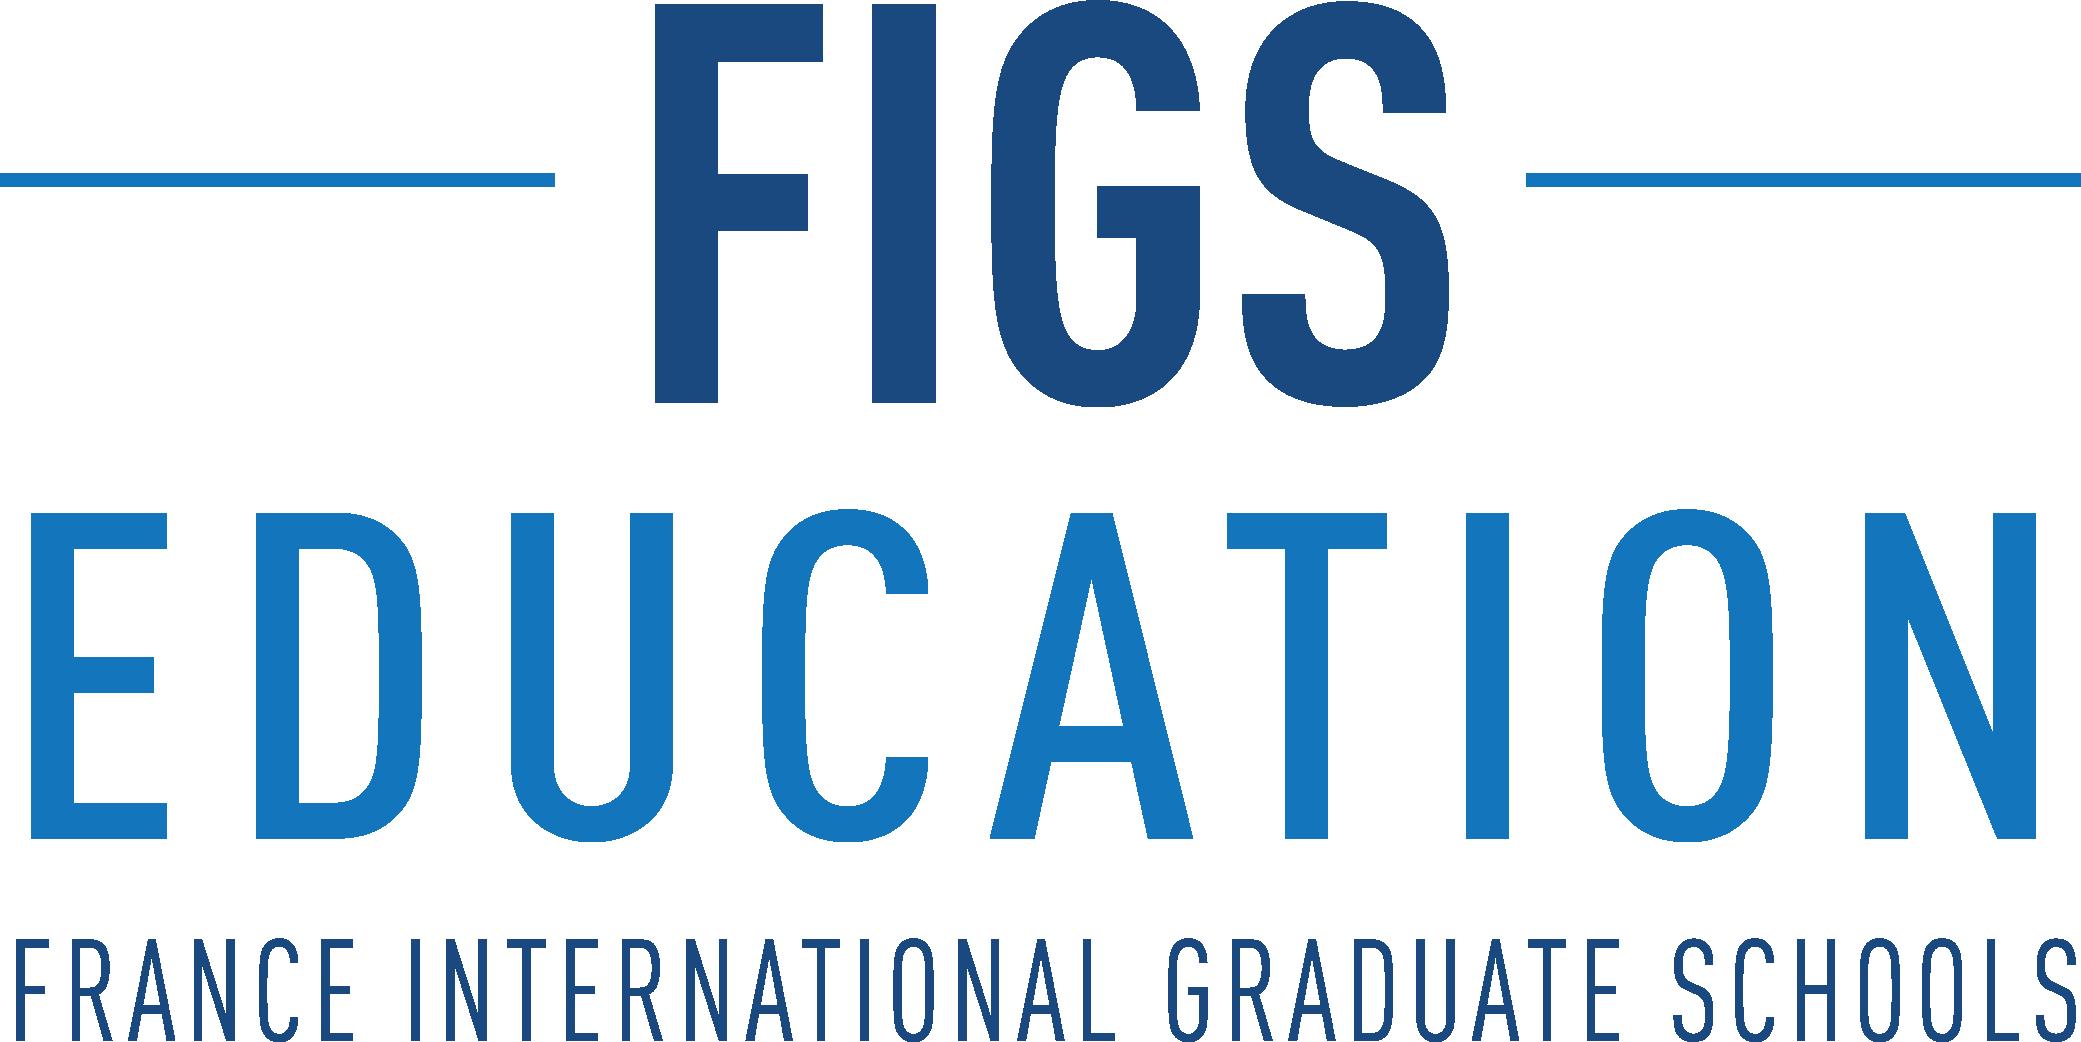 FIGS - France International Graduate Schools